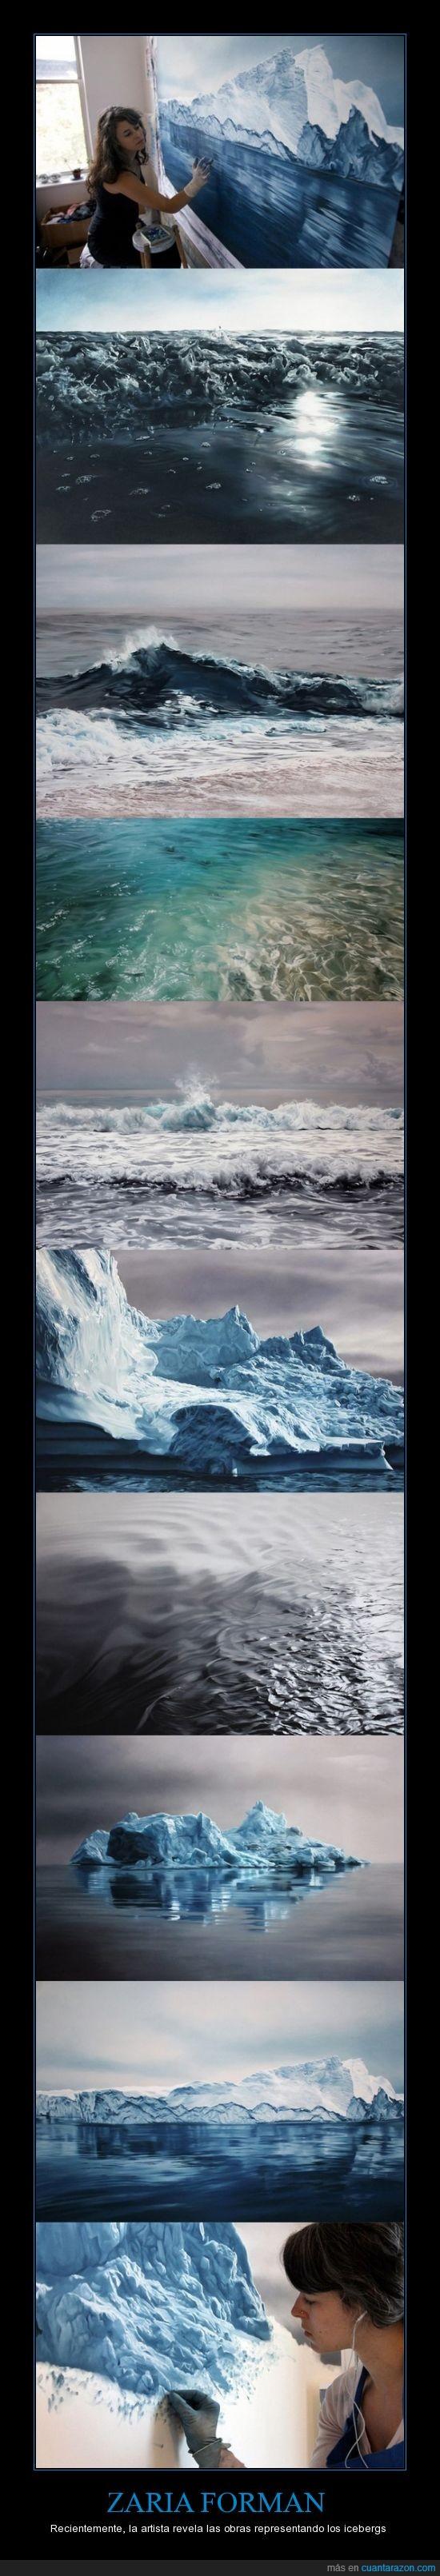 arte,artista,azul,color,dibujo,hielo,iceberg,ilustracion,Zaria Forman